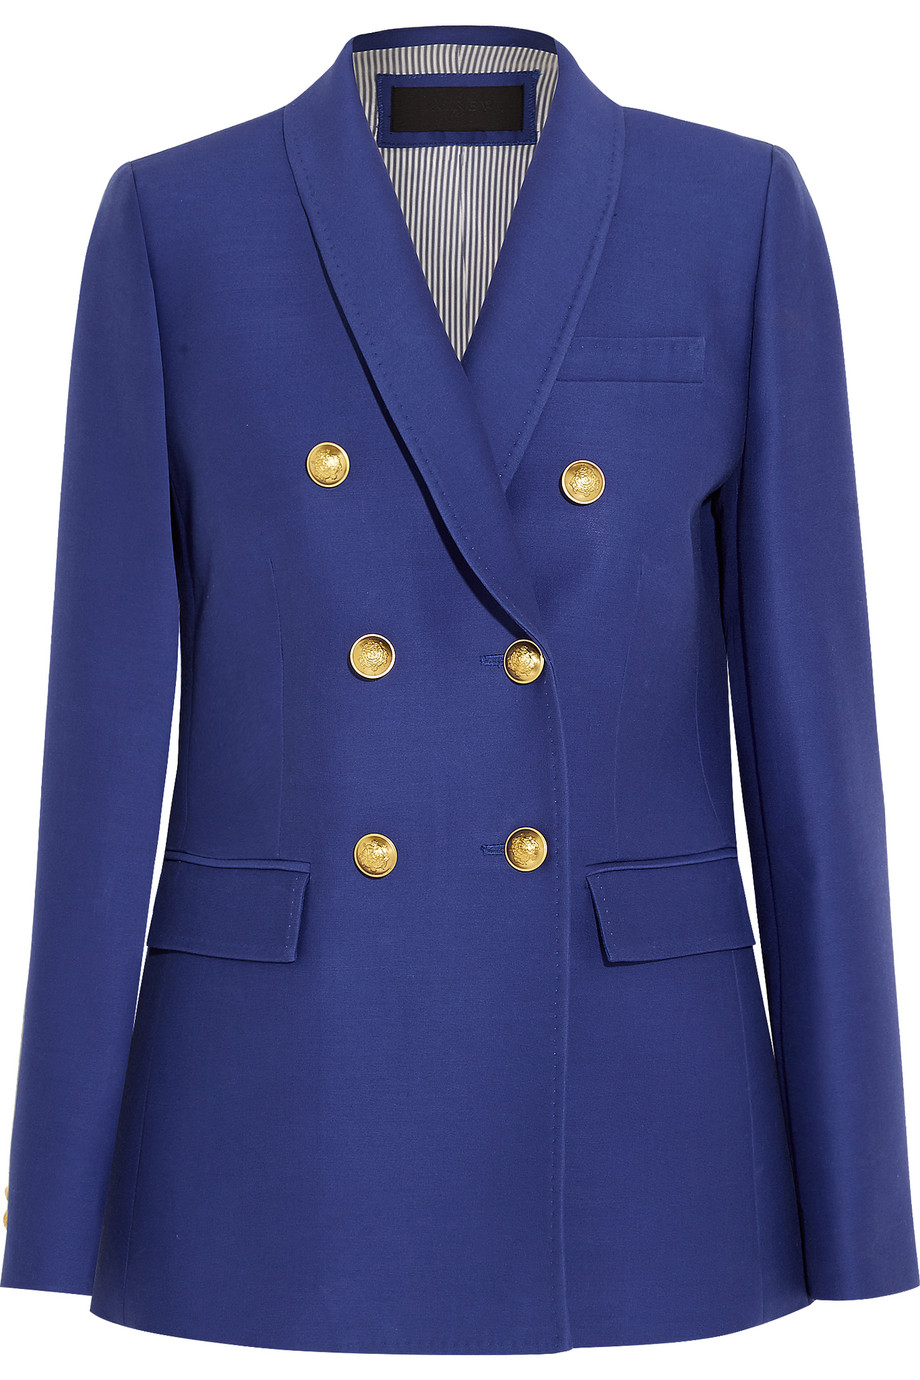 J.Crew Irene Wool and Silk-Blend Faille Blazer, Royal Blue, Women's, Size: 12